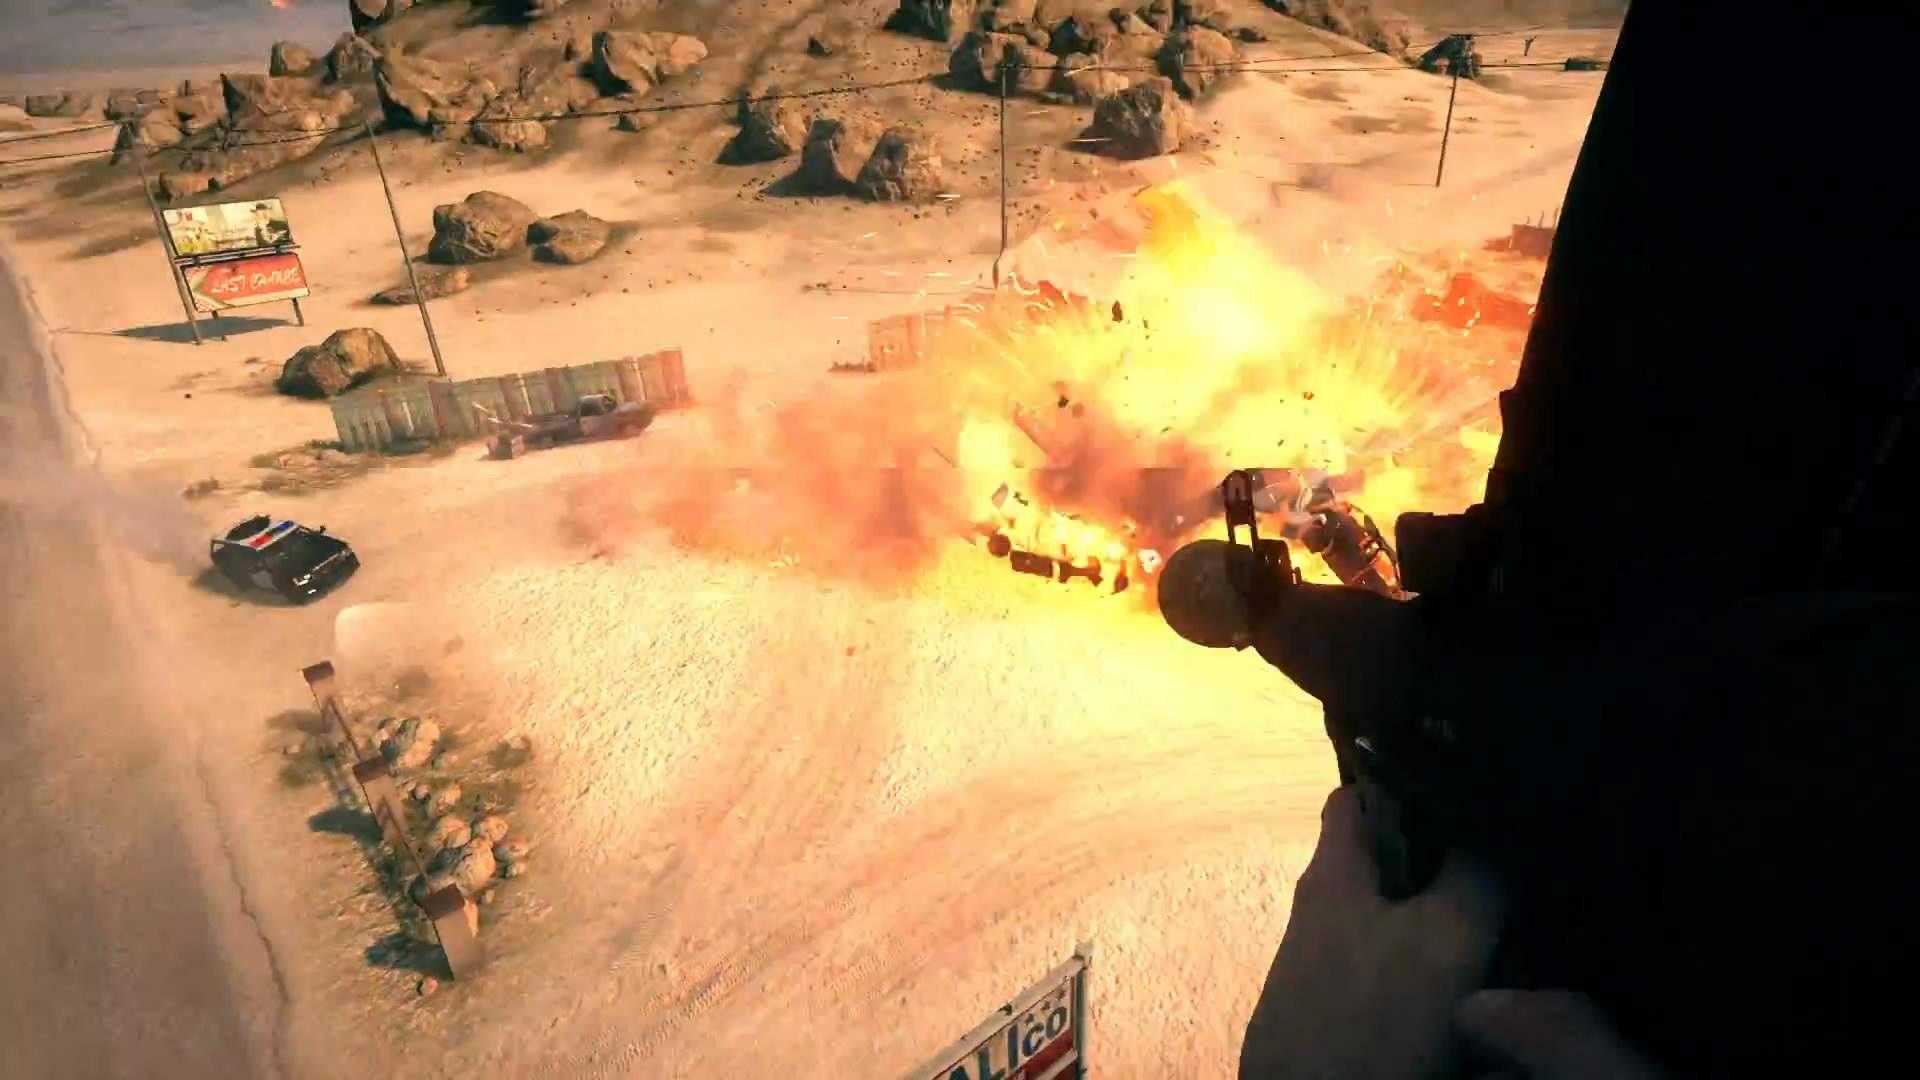 Battlefield-Hardline-Real-Gameplay.mp4_snapshot_06.10_2014.05.28_12.49.11